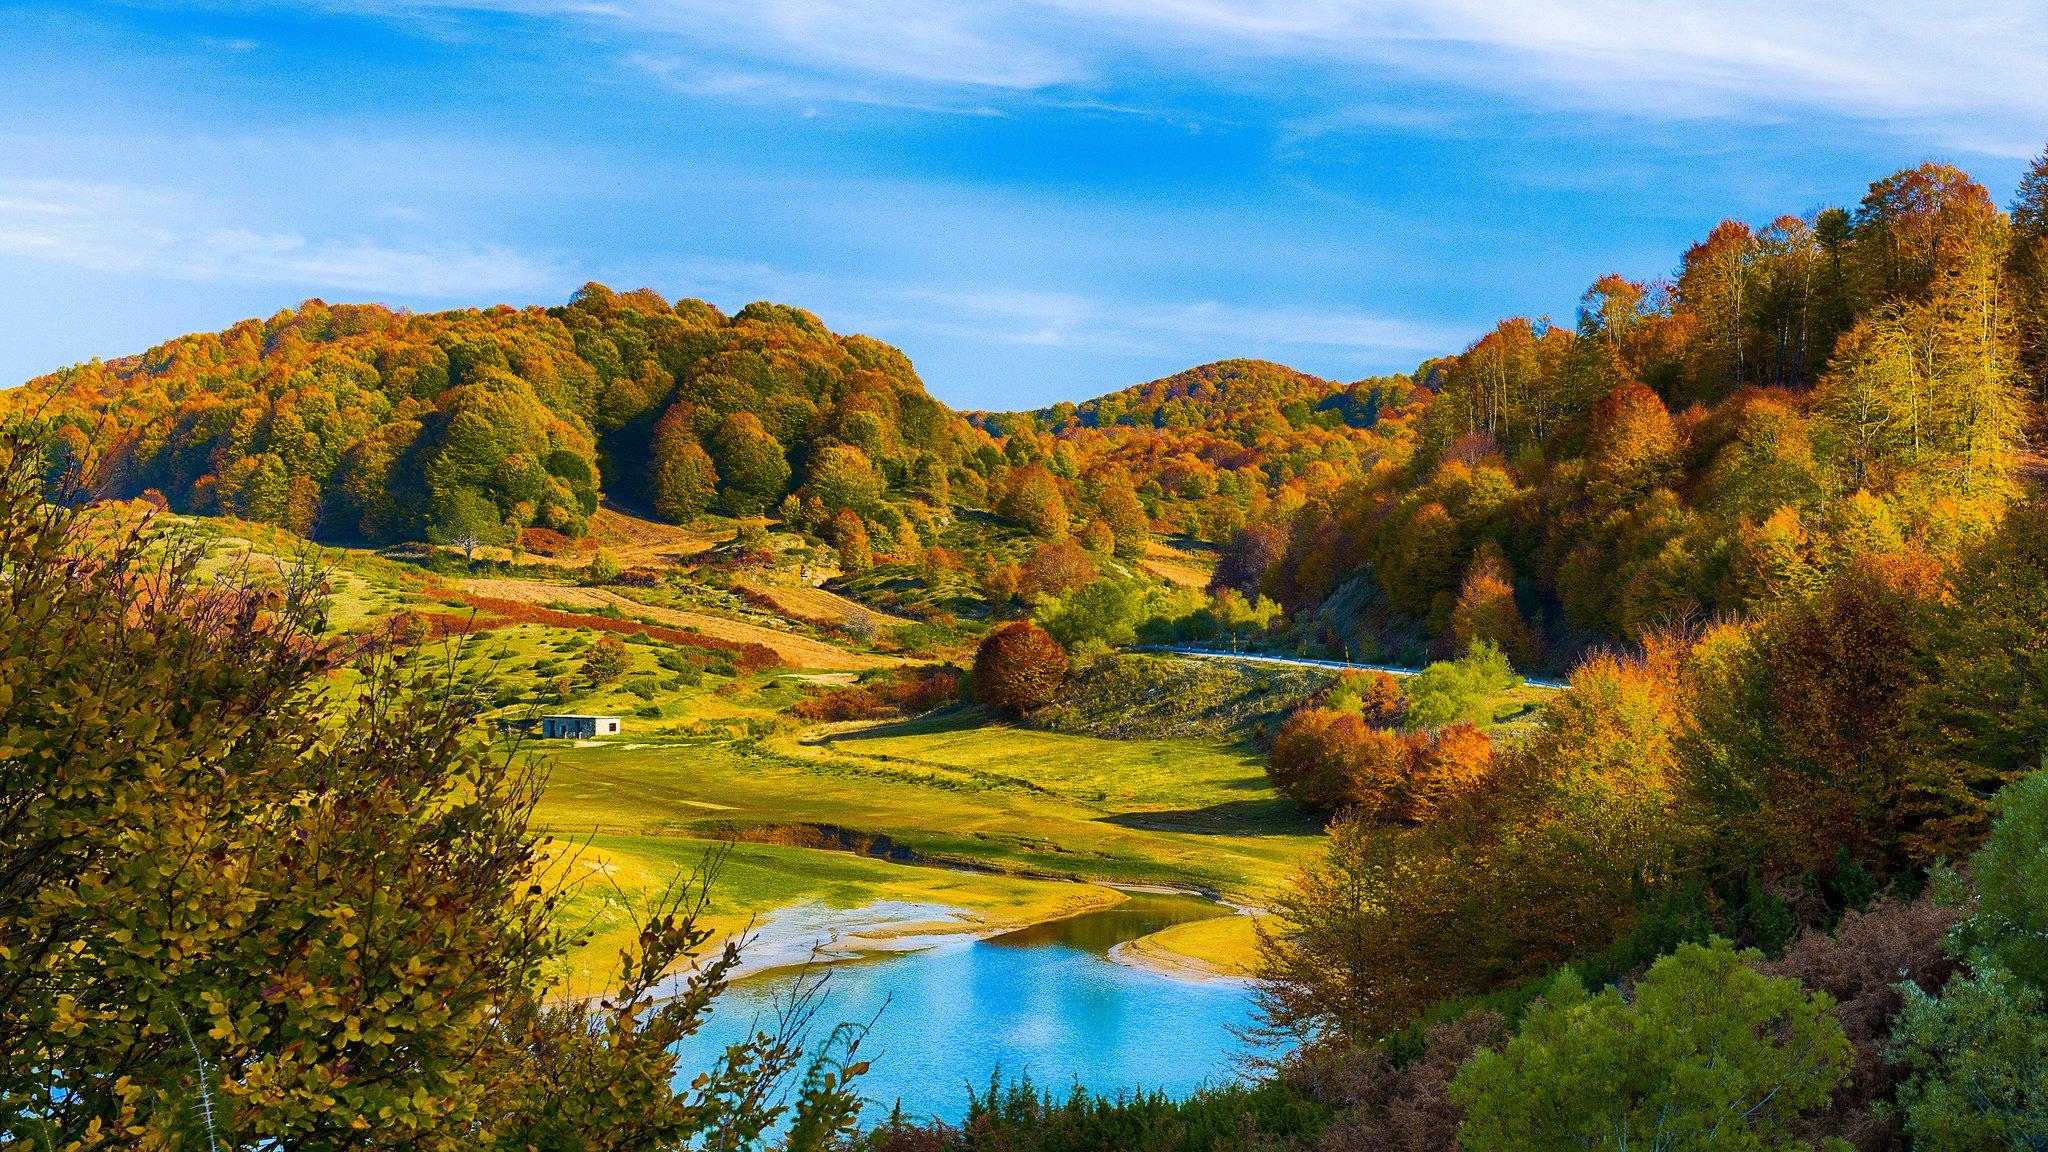 Autumn Colors Forest Hills Lake Autumn Wallpaper 2048x1152 247265